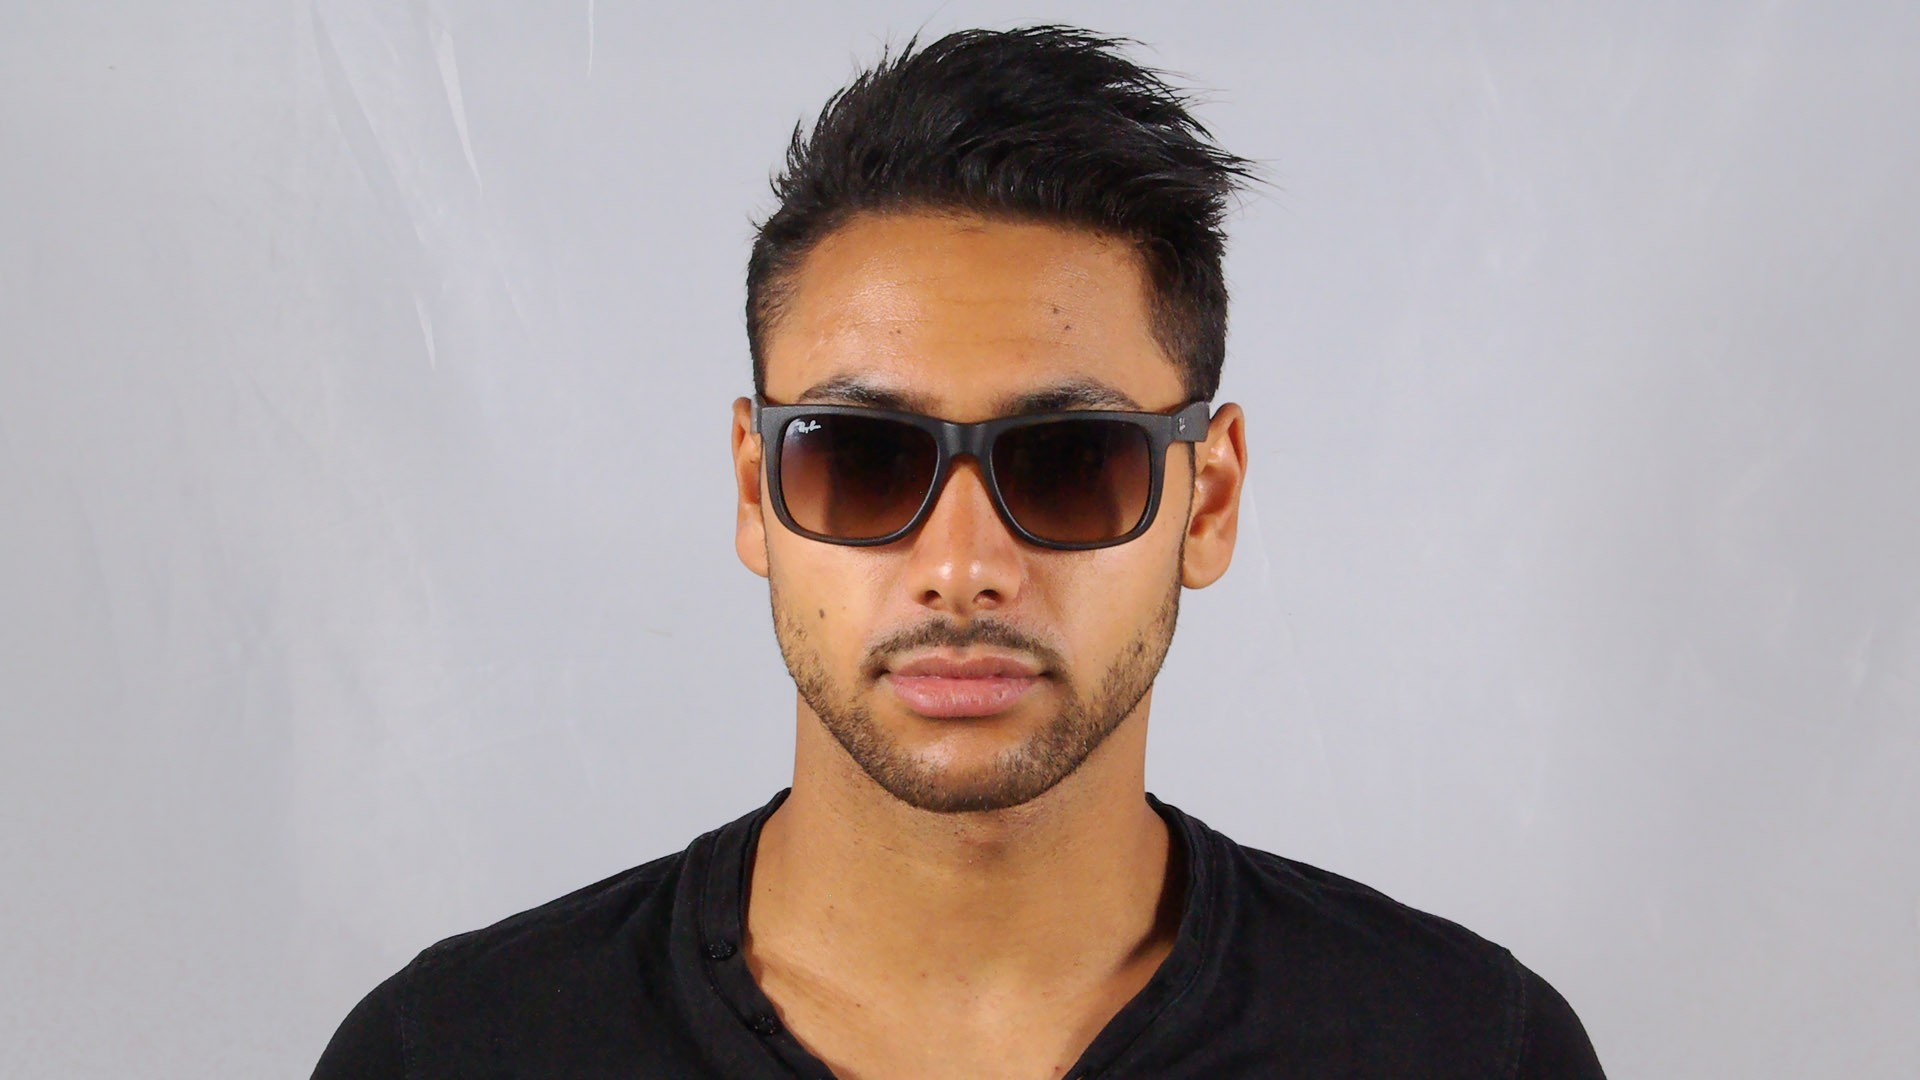 ea7ef39ad6e4 Sunglasses Ray-Ban Justin Tortoise RB4165 710/13 51-16 Medium Gradient